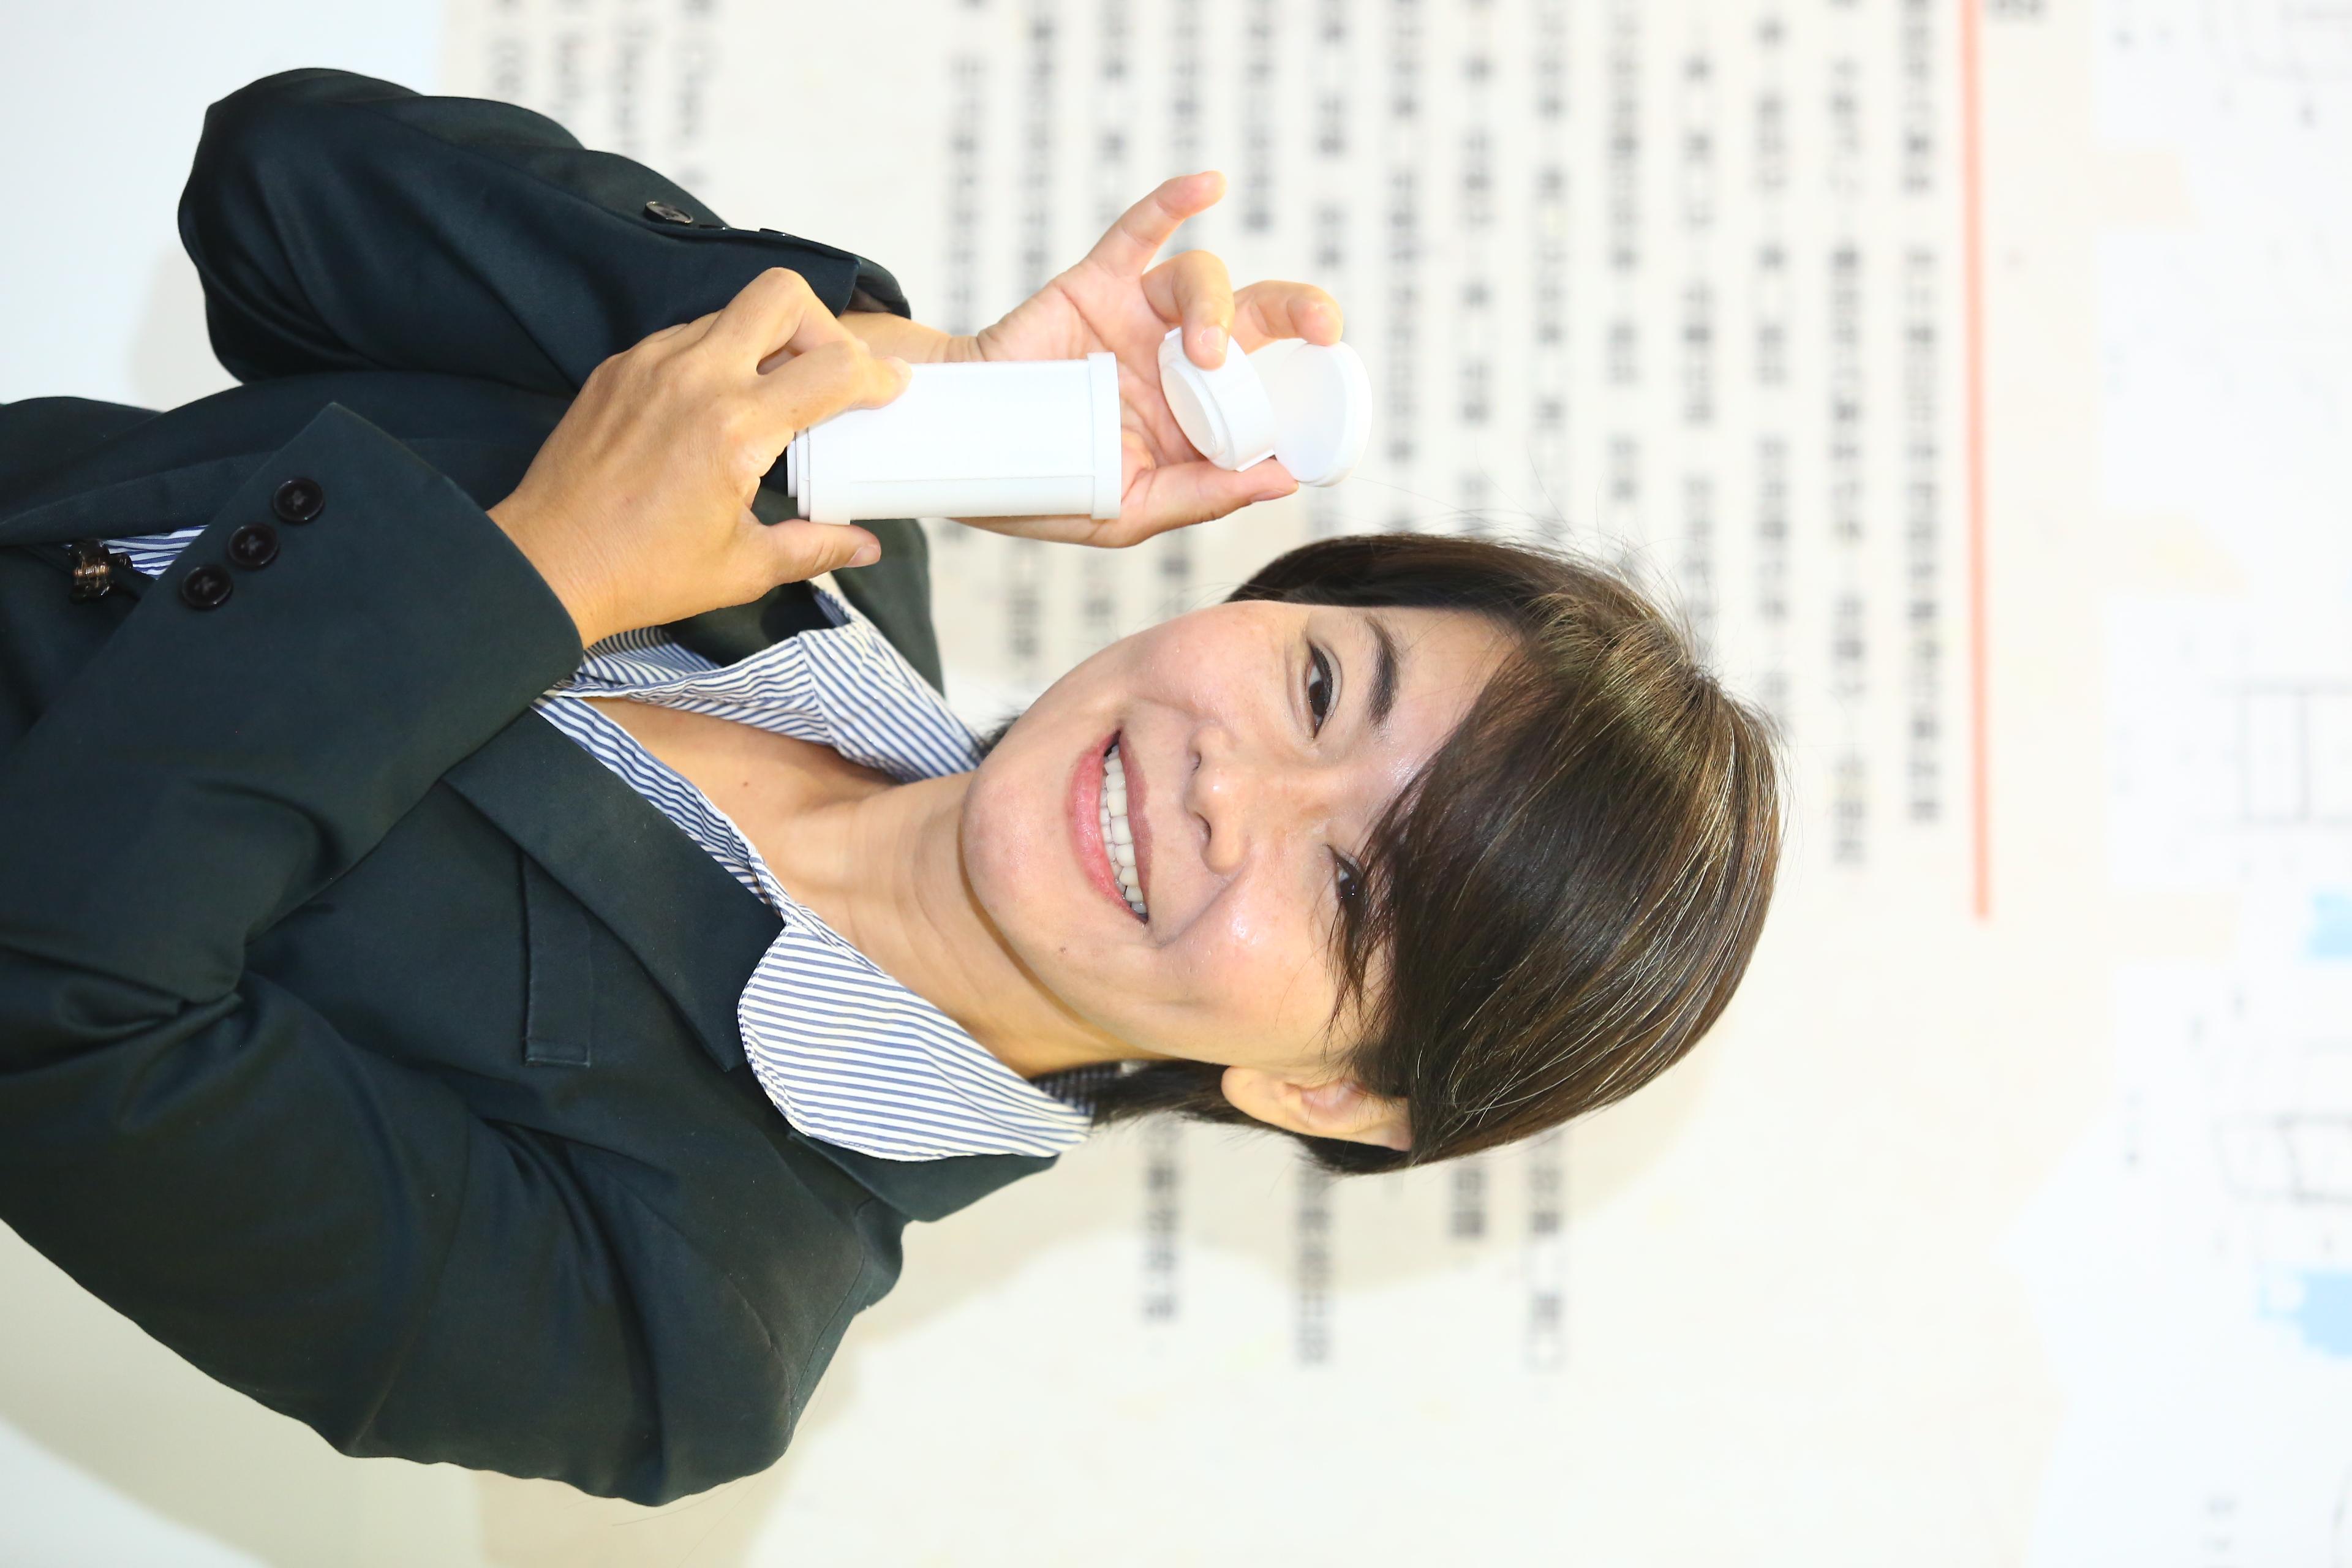 https://storage.googleapis.com/www.taiwantradeshow.com.tw/activity-photo/202009/T-07389233-name.jpg